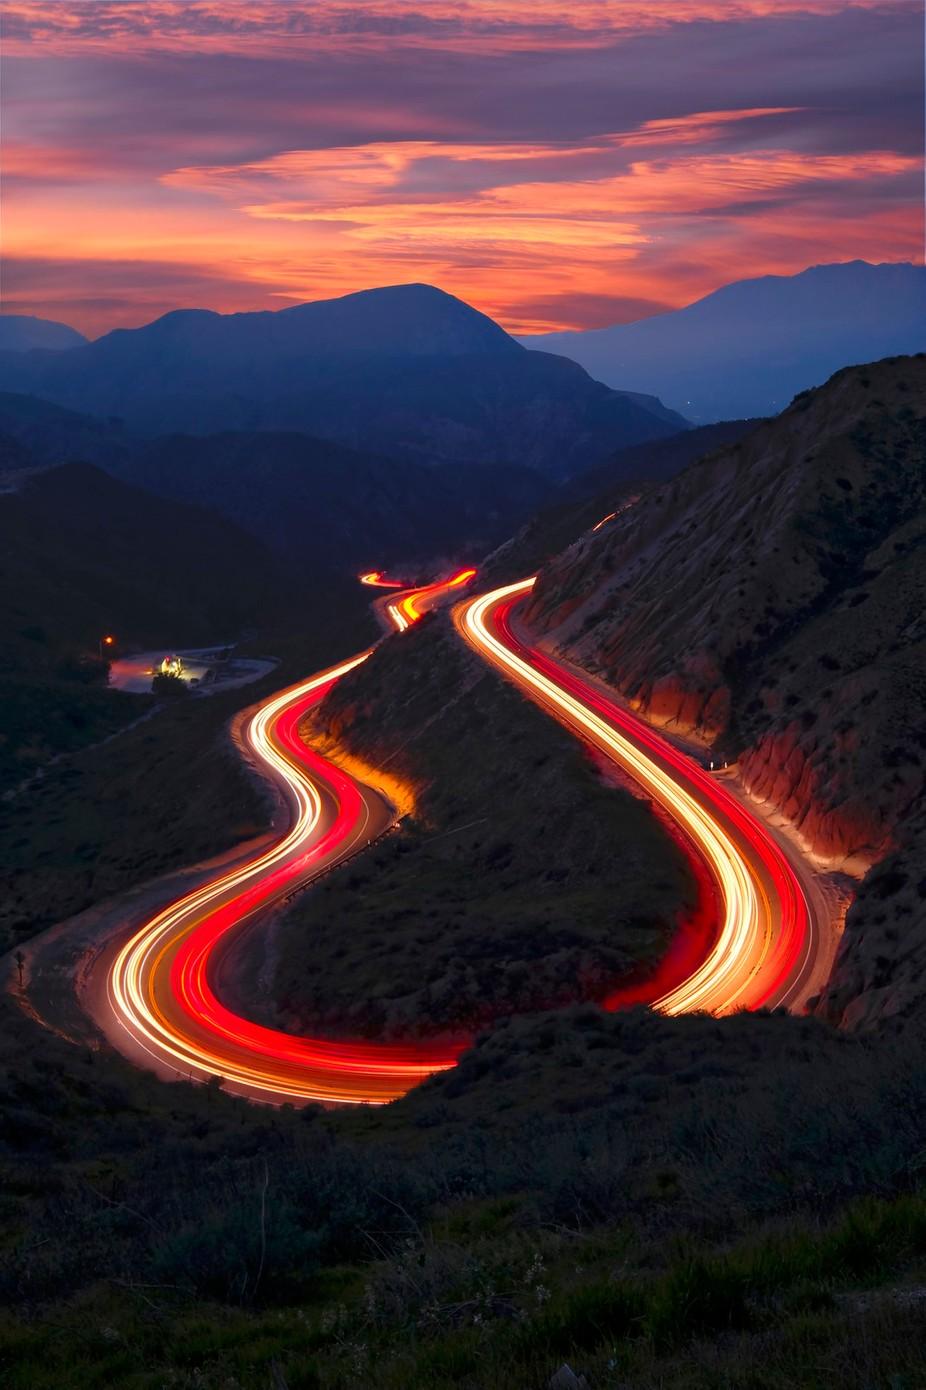 Luminous Landscape by dynastesgranti - Sunrise Or Sunset Photo Contest